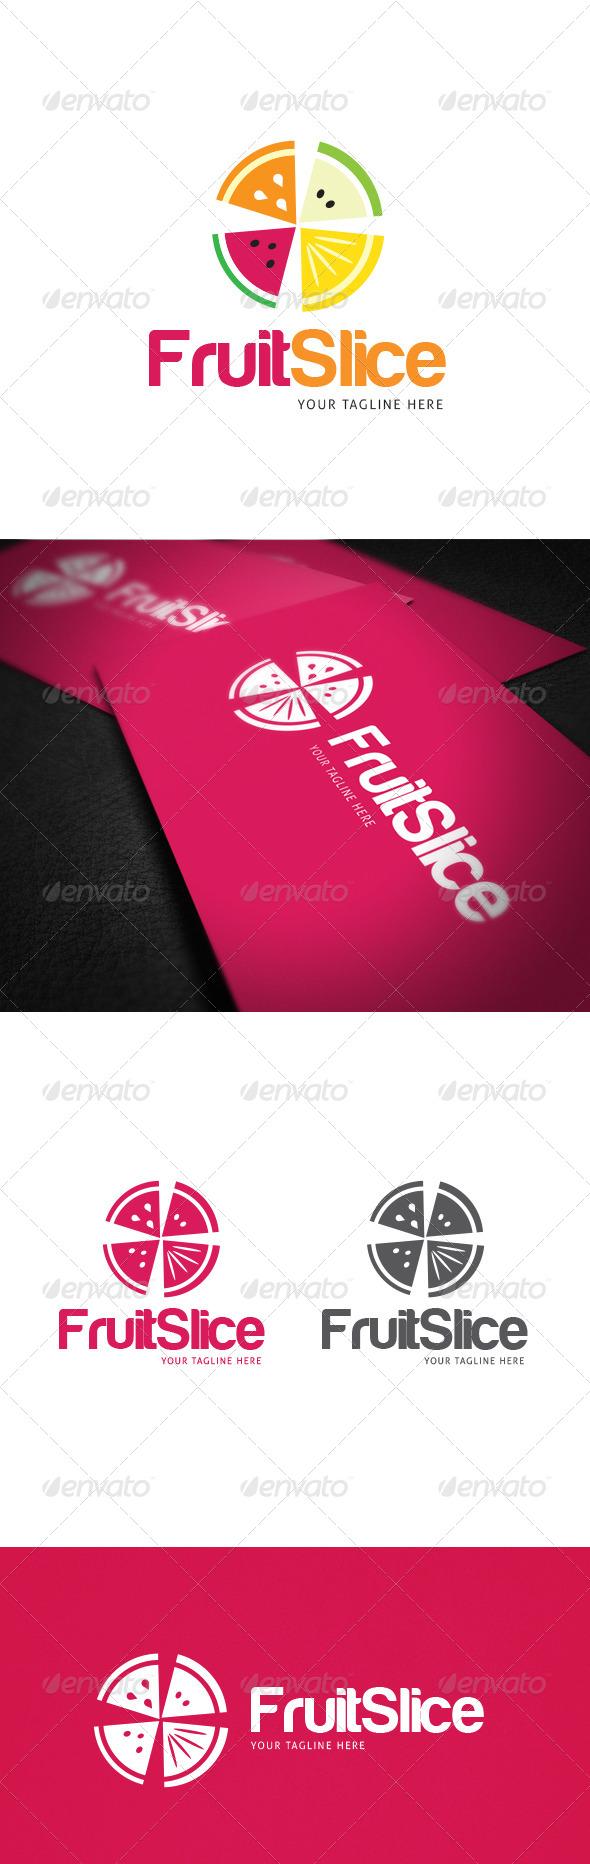 GraphicRiver Fruit Slice Logo Template 8021766